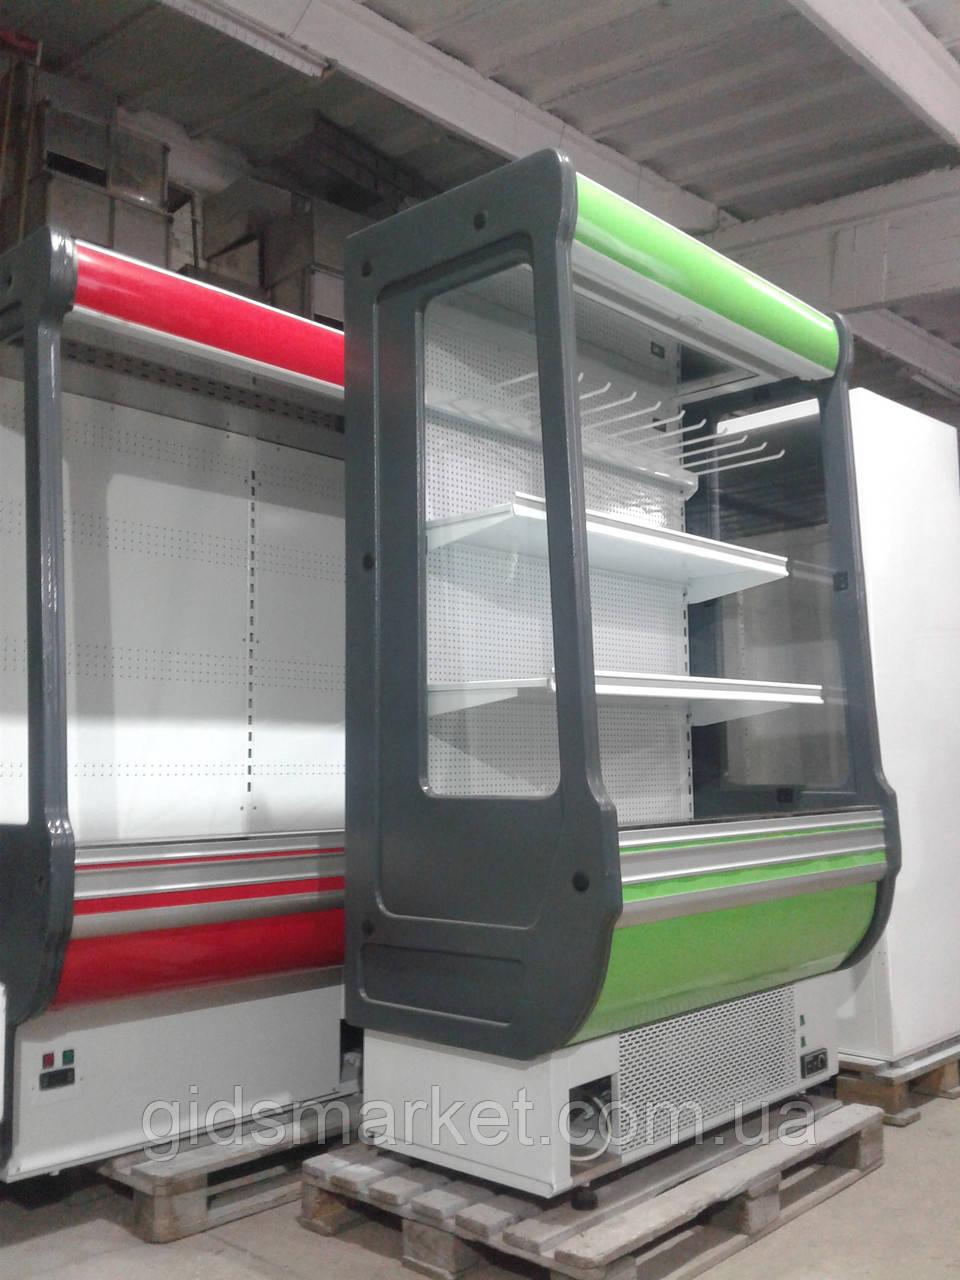 Холодильная горка Cold 1.25 м. б у, холодильный регал б/у, горка холодильная б у